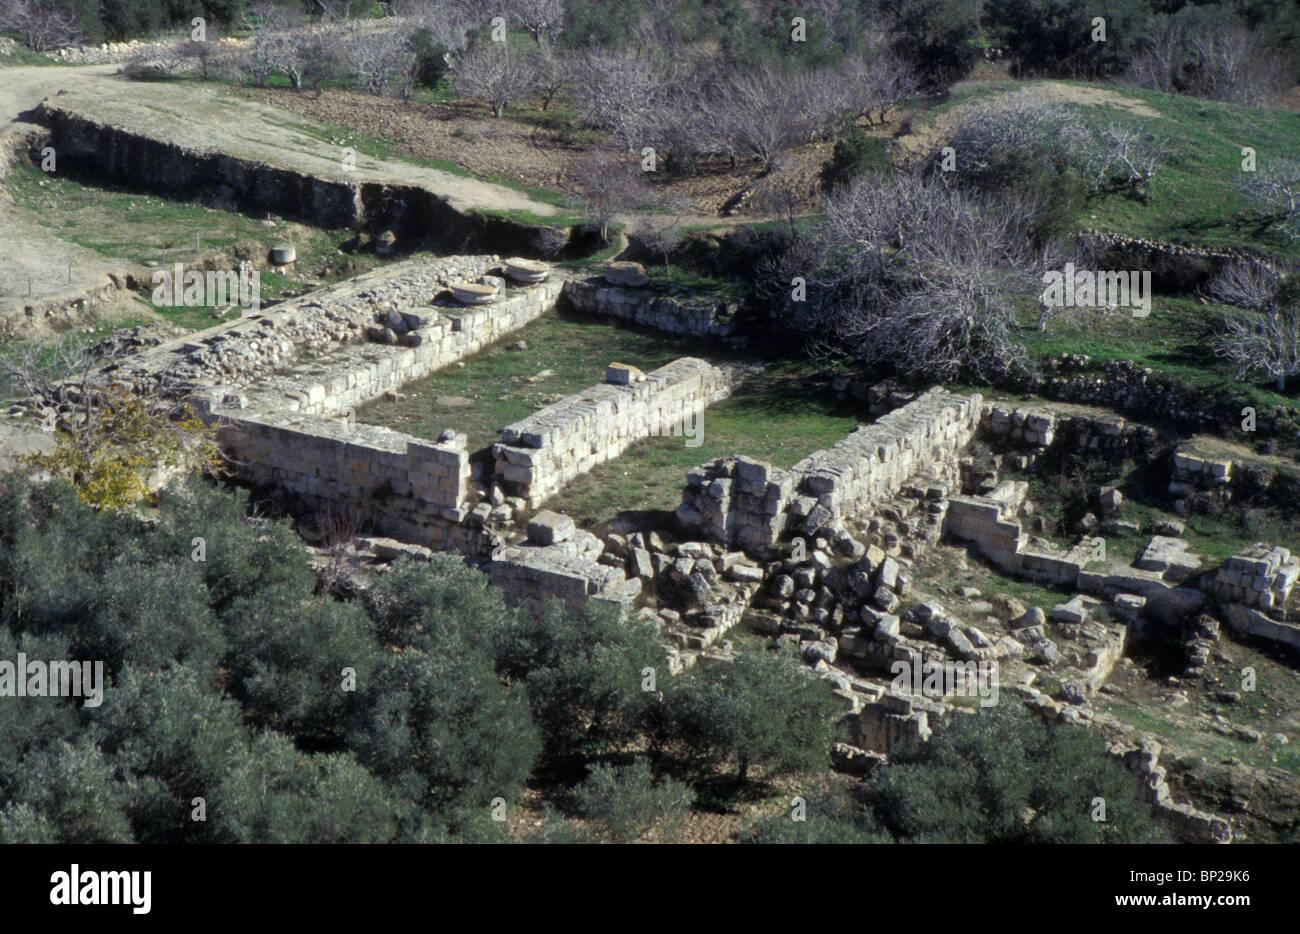 3112. SAMARIA (SHOMRON) - REMAINS OF KING AHAB'S PALACE DATING FROM C. 860 B.C. Stock Photo